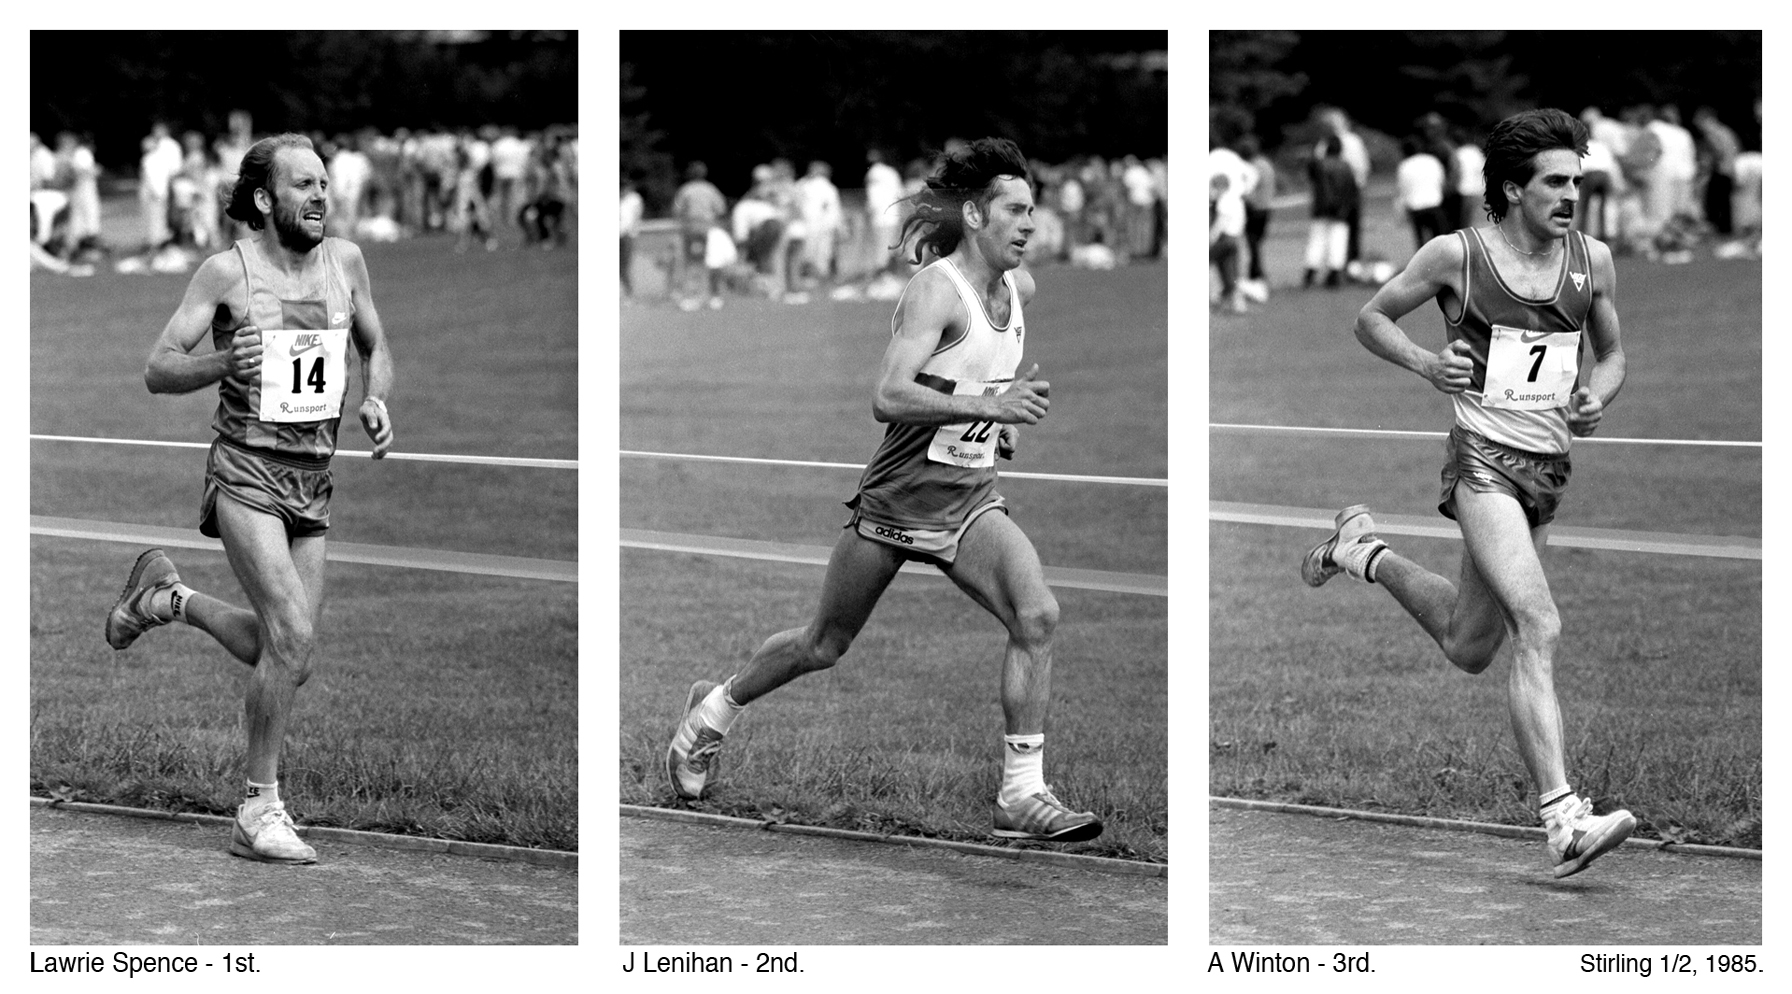 Lawrie Spence - 1st, Stirling Half, 1985. Photo Graham MacIndoe